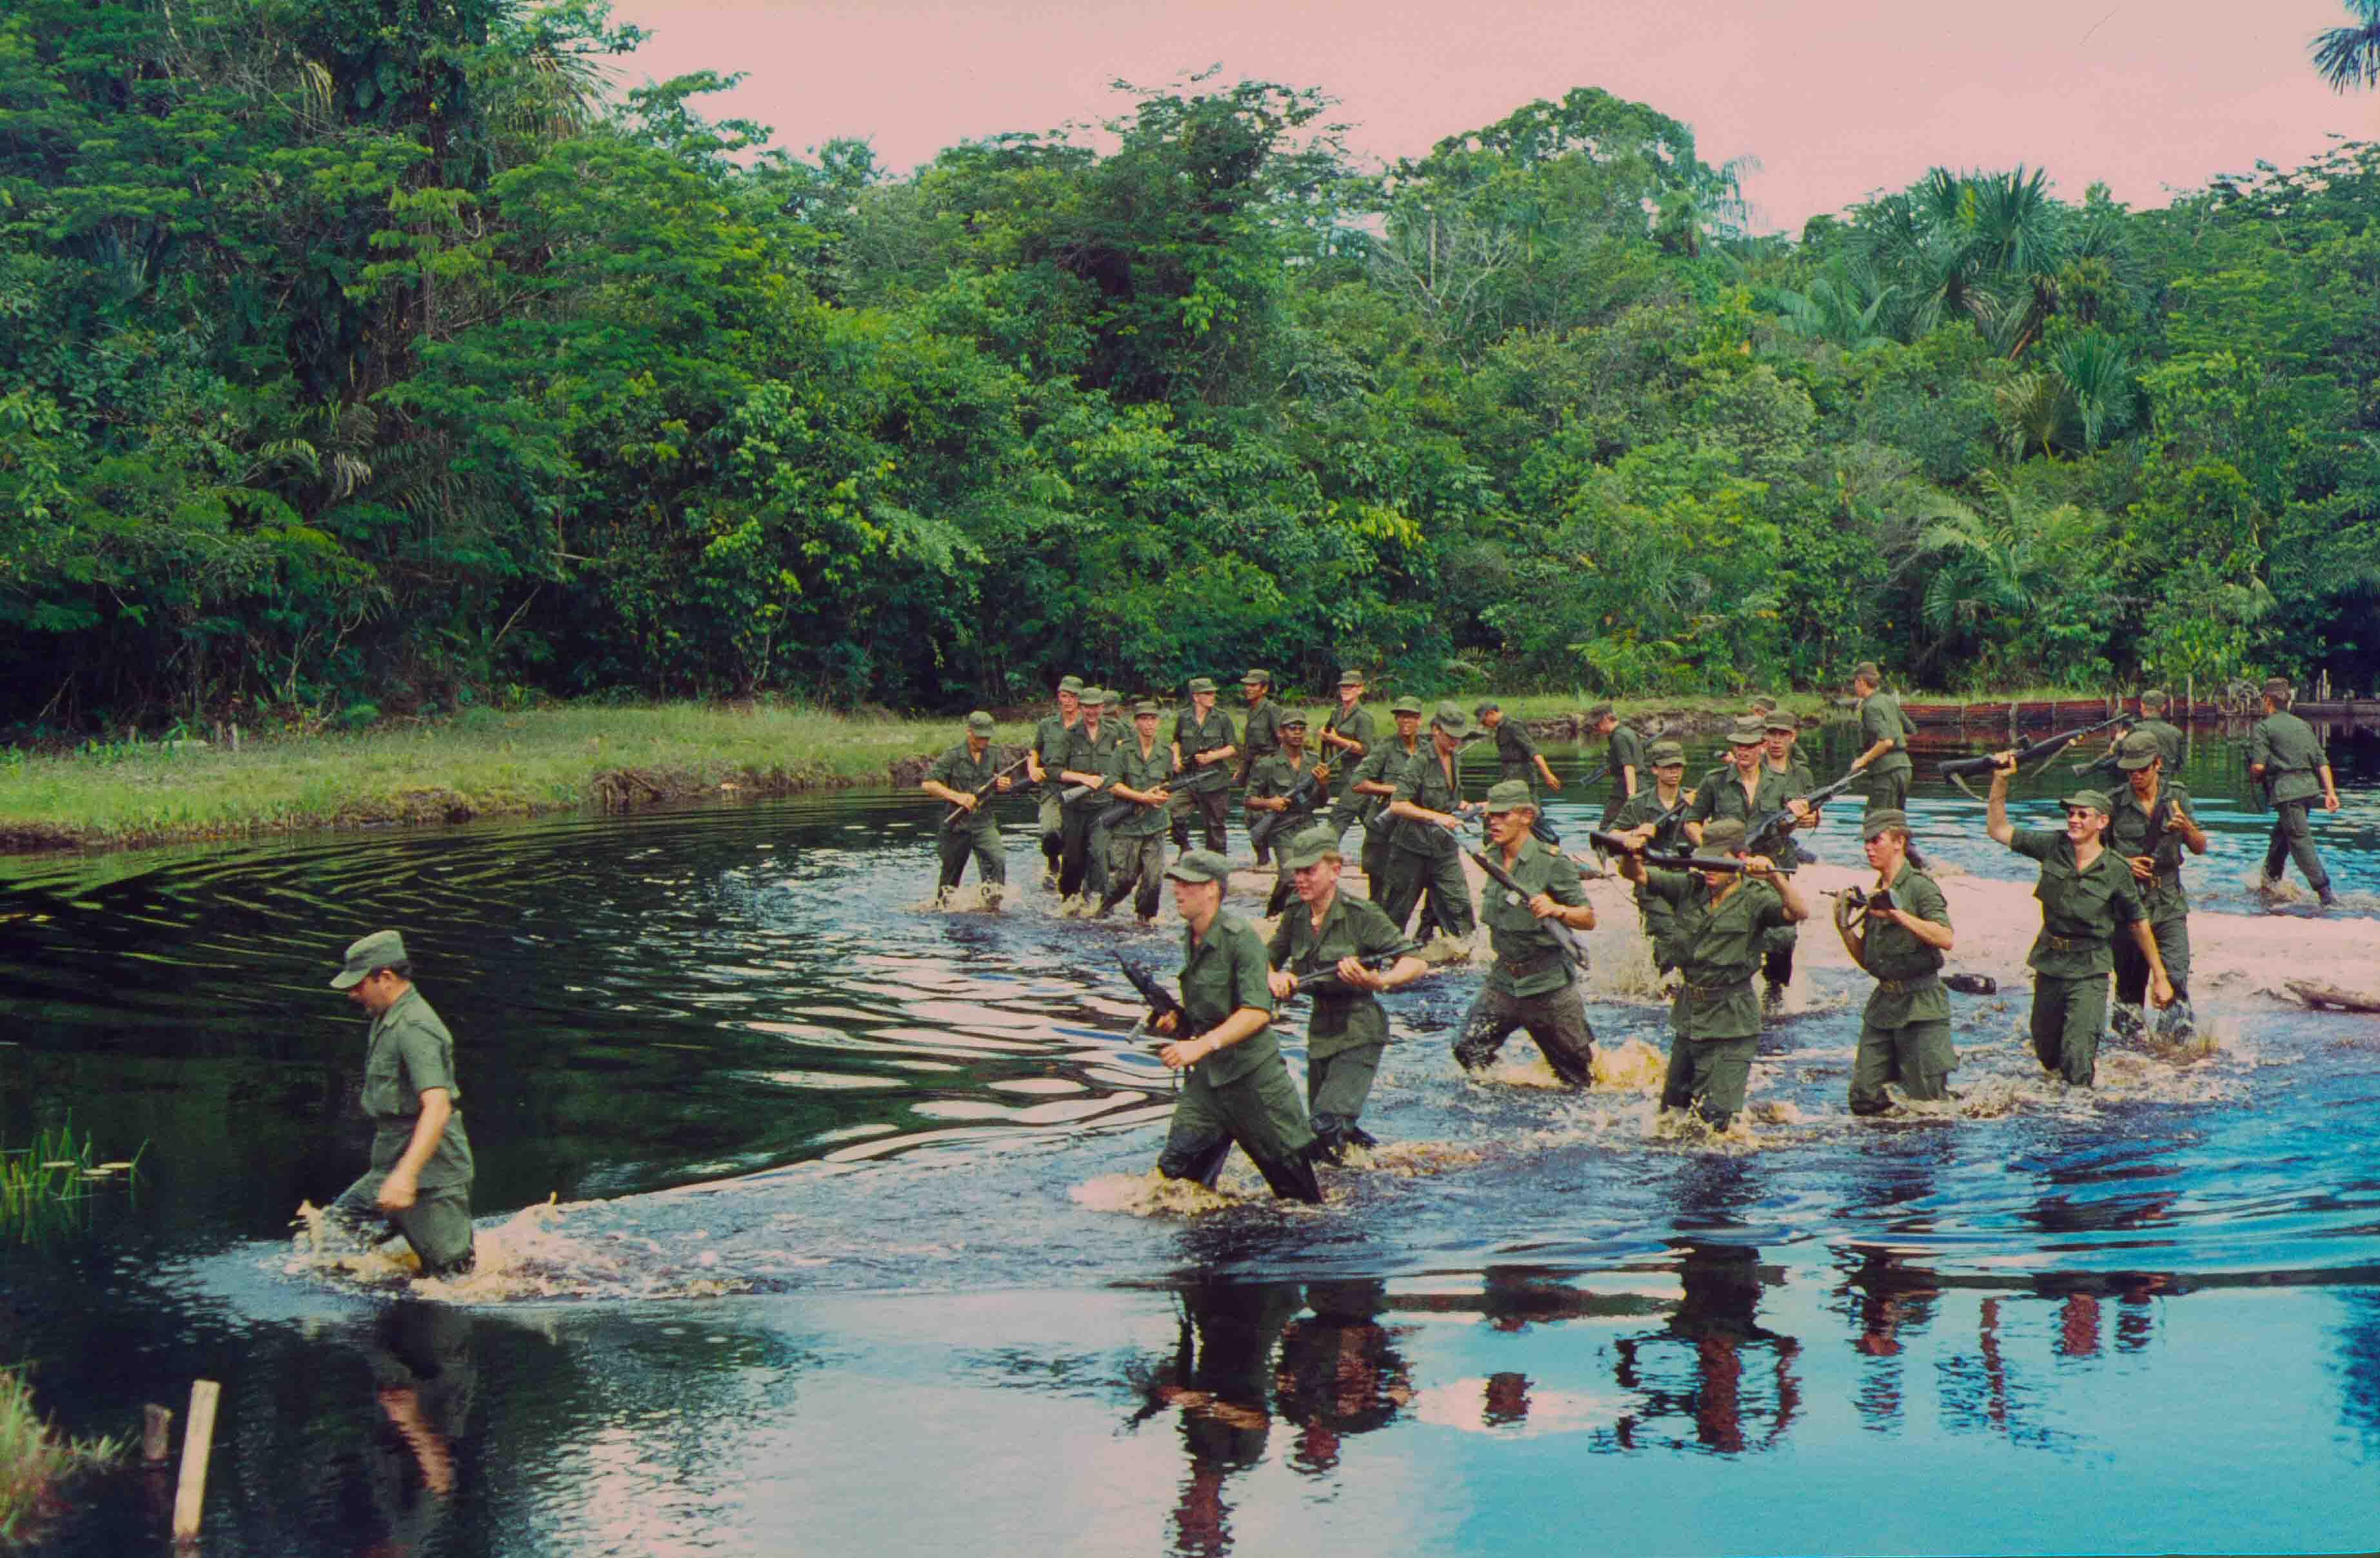 105. Suriname